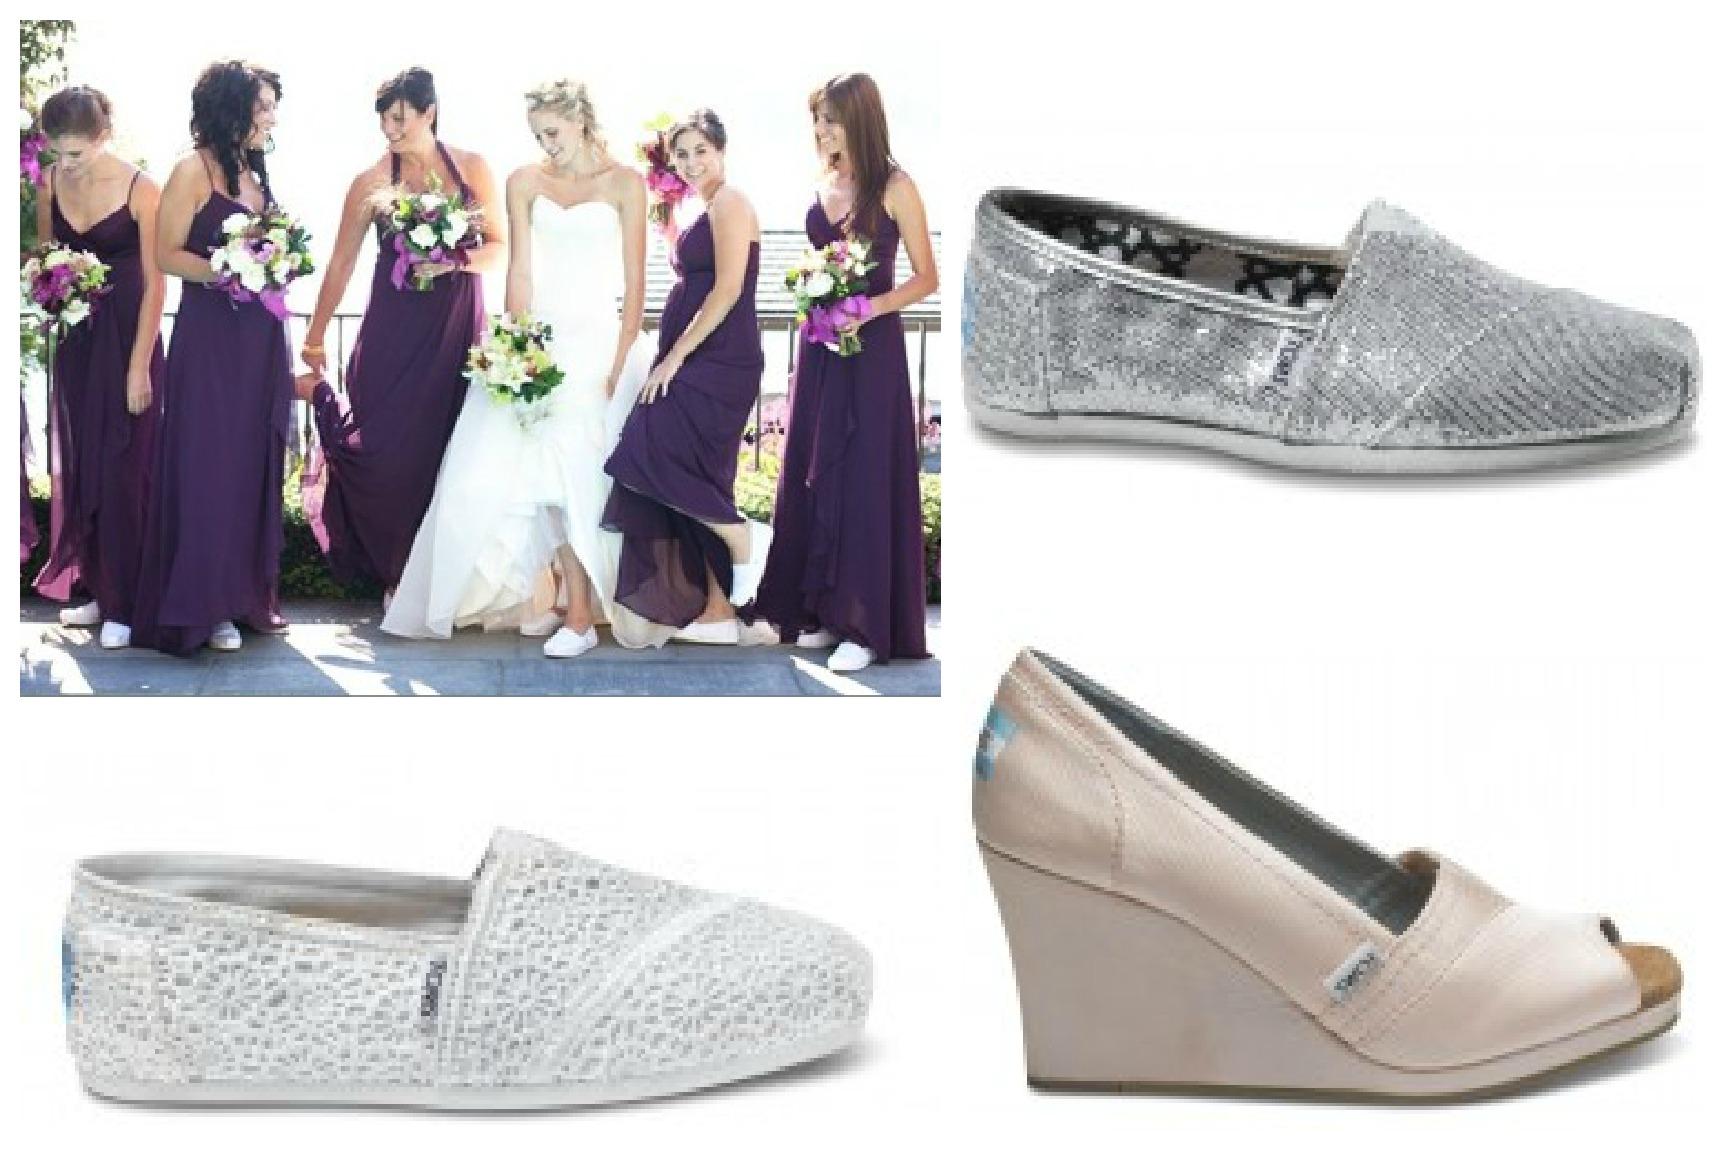 unique wedding shoes toms wedding shoes www toms com weddingcollection